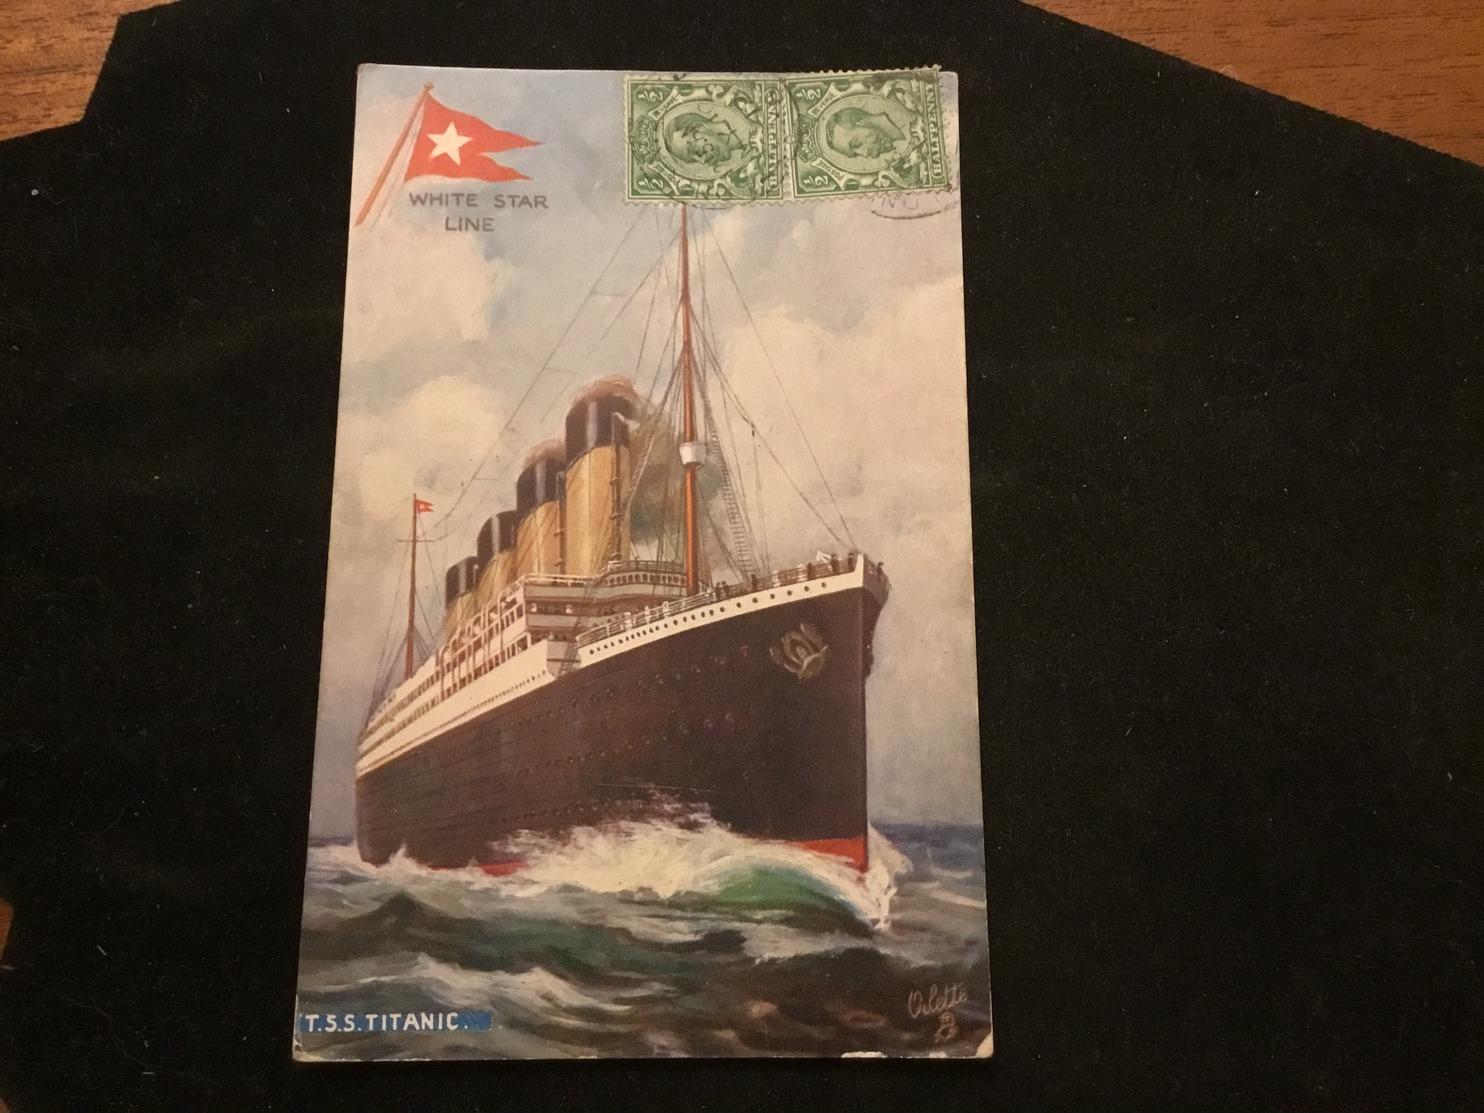 White Star Line T.S.S Titanic - Paquebots